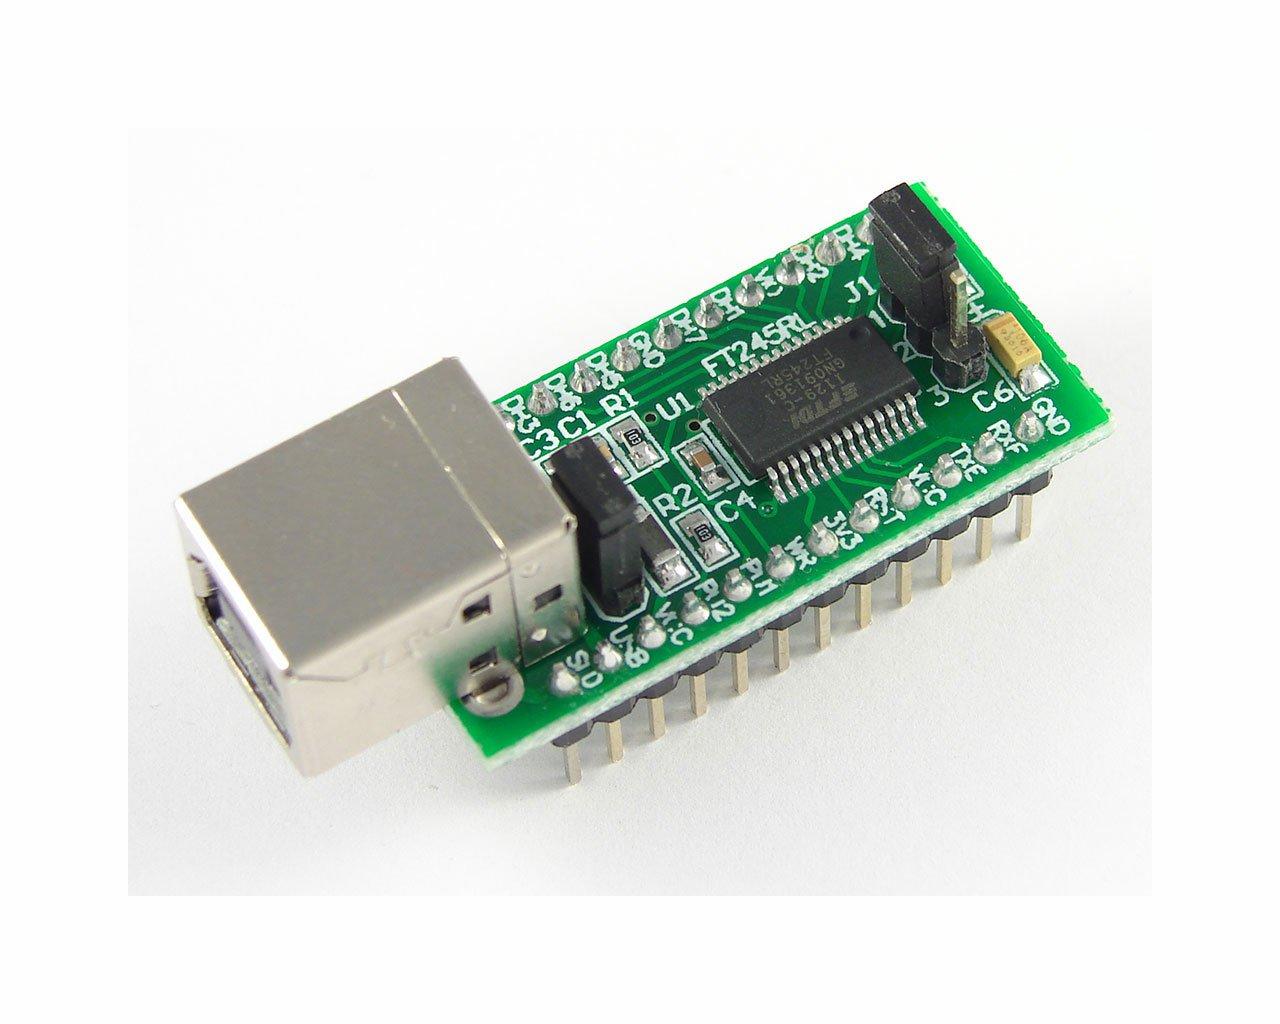 FTDI UM245R USB-Parallel FIFO module - FT245RL AVR PIC ARM ARM7 ARM9